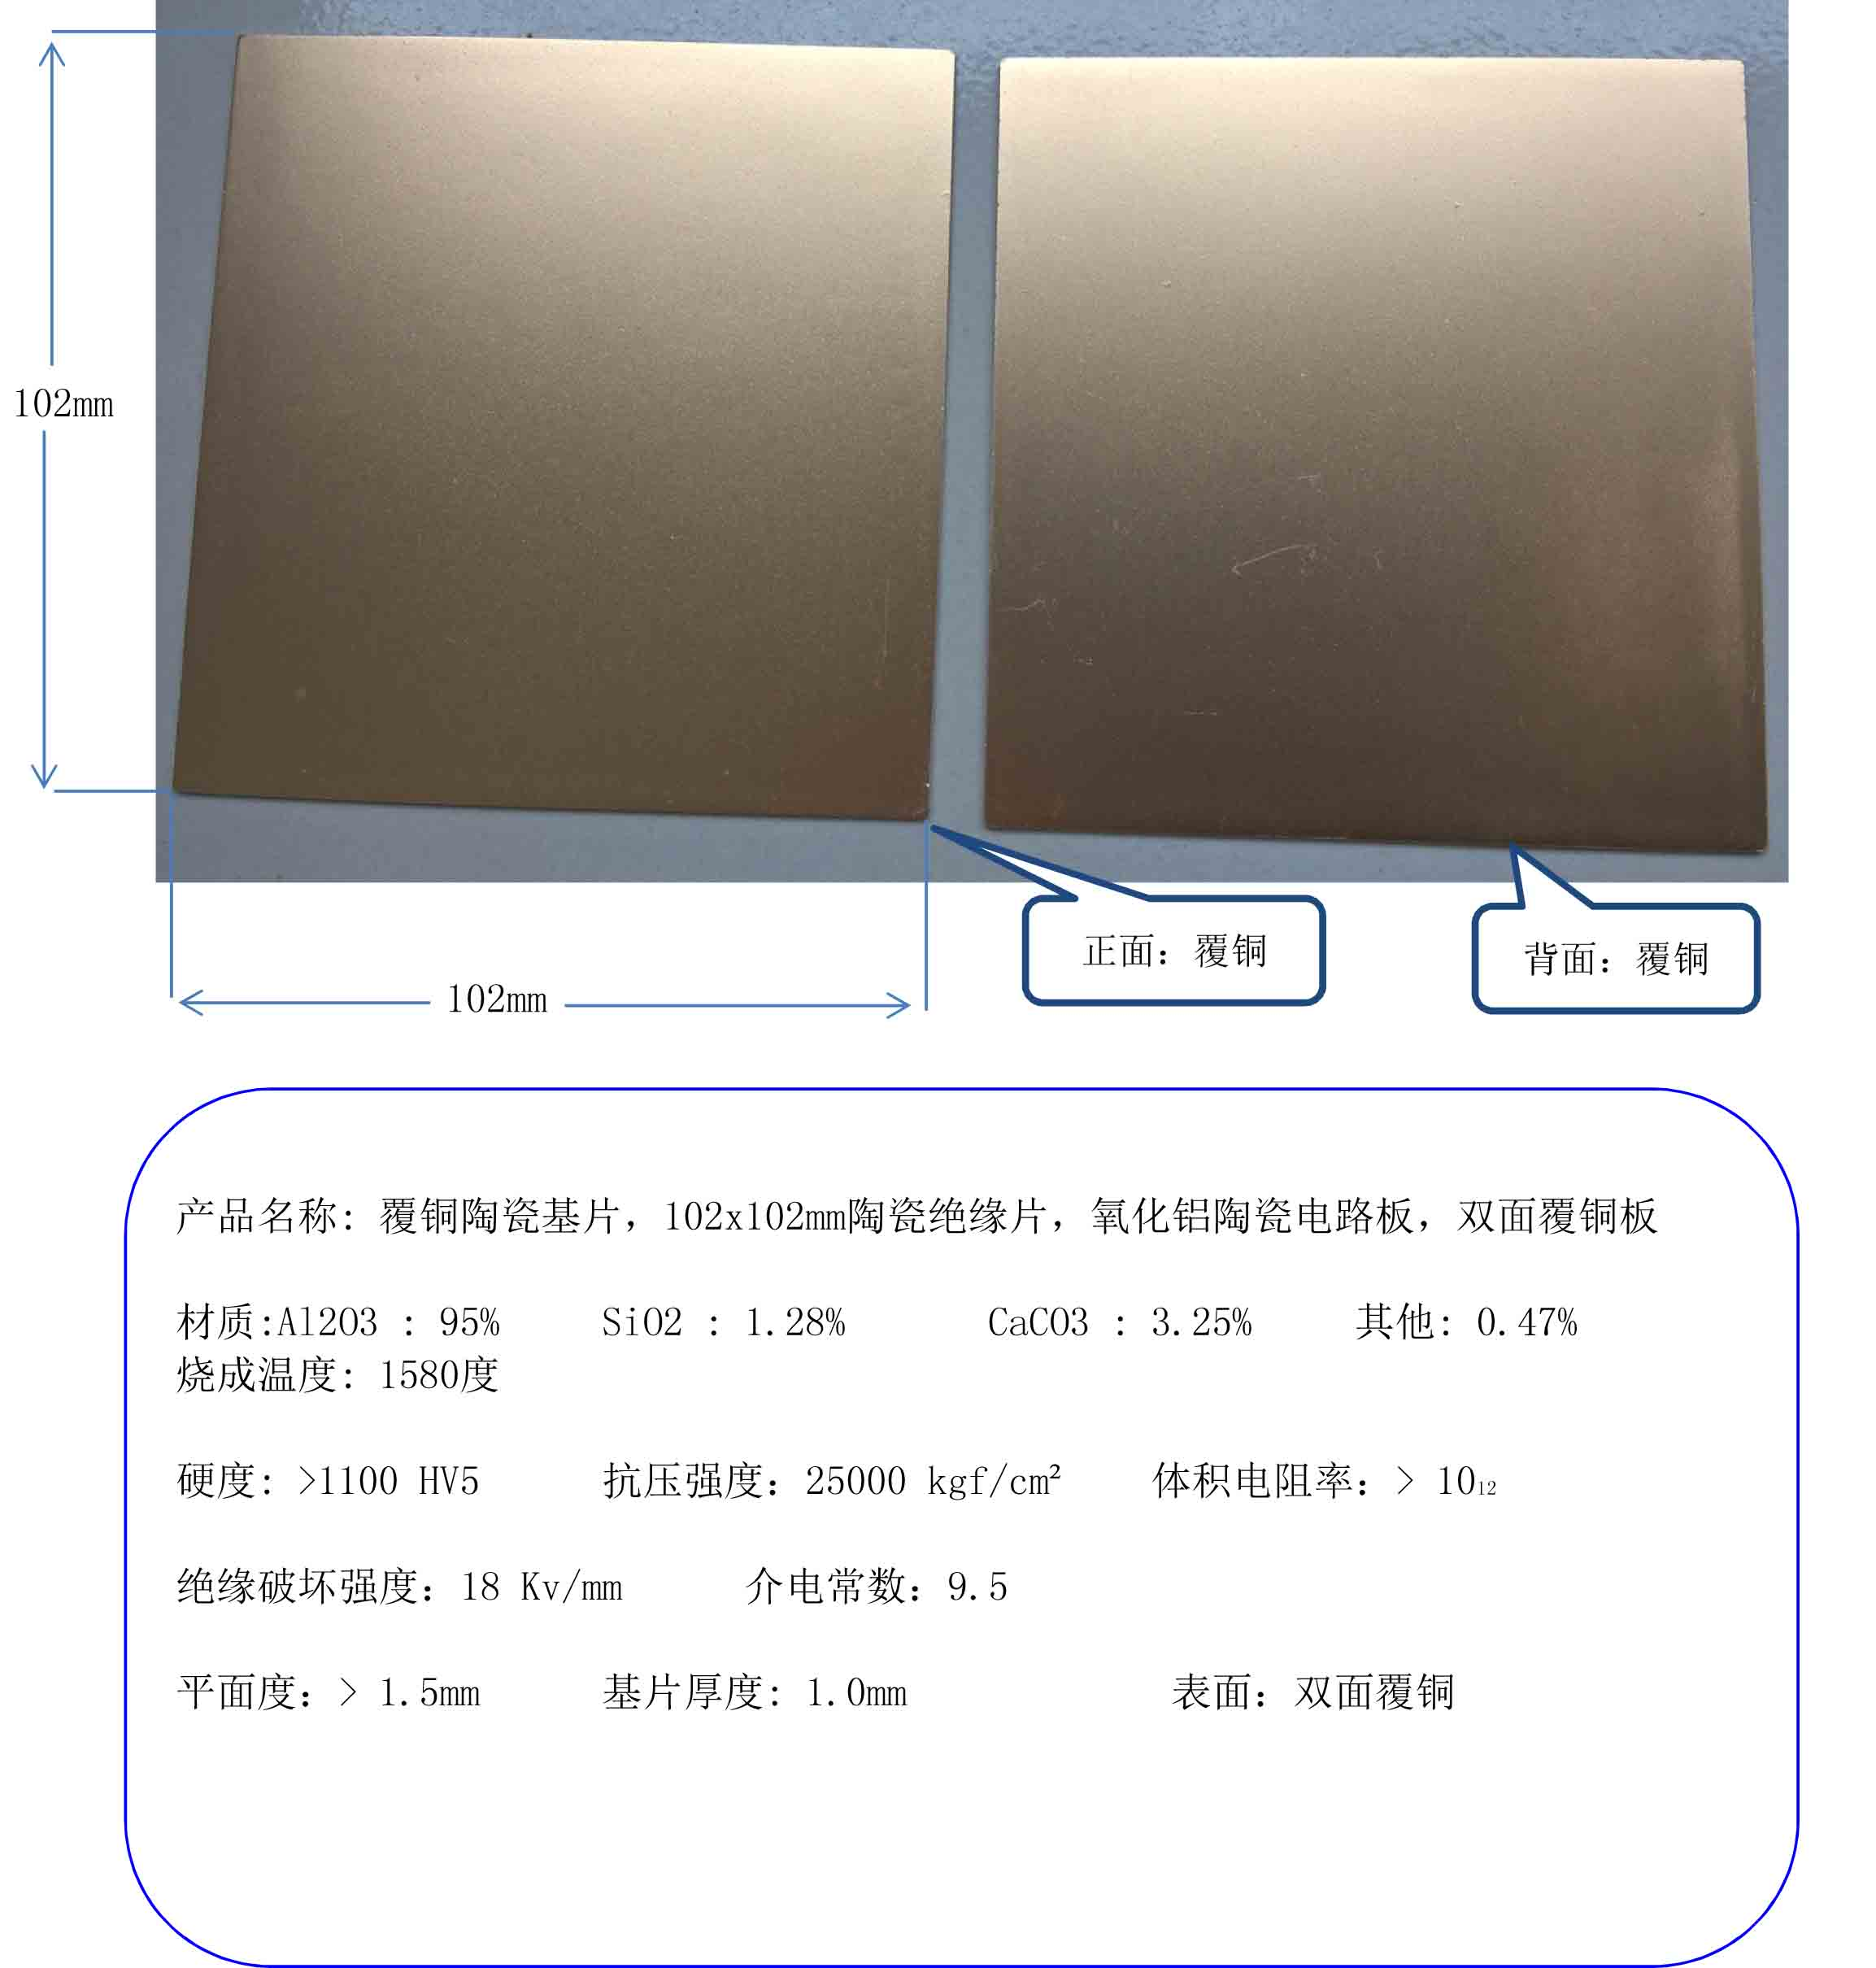 Copper coated ceramic substrate, 102x102mm insulation, alumina ceramic circuit board<br>